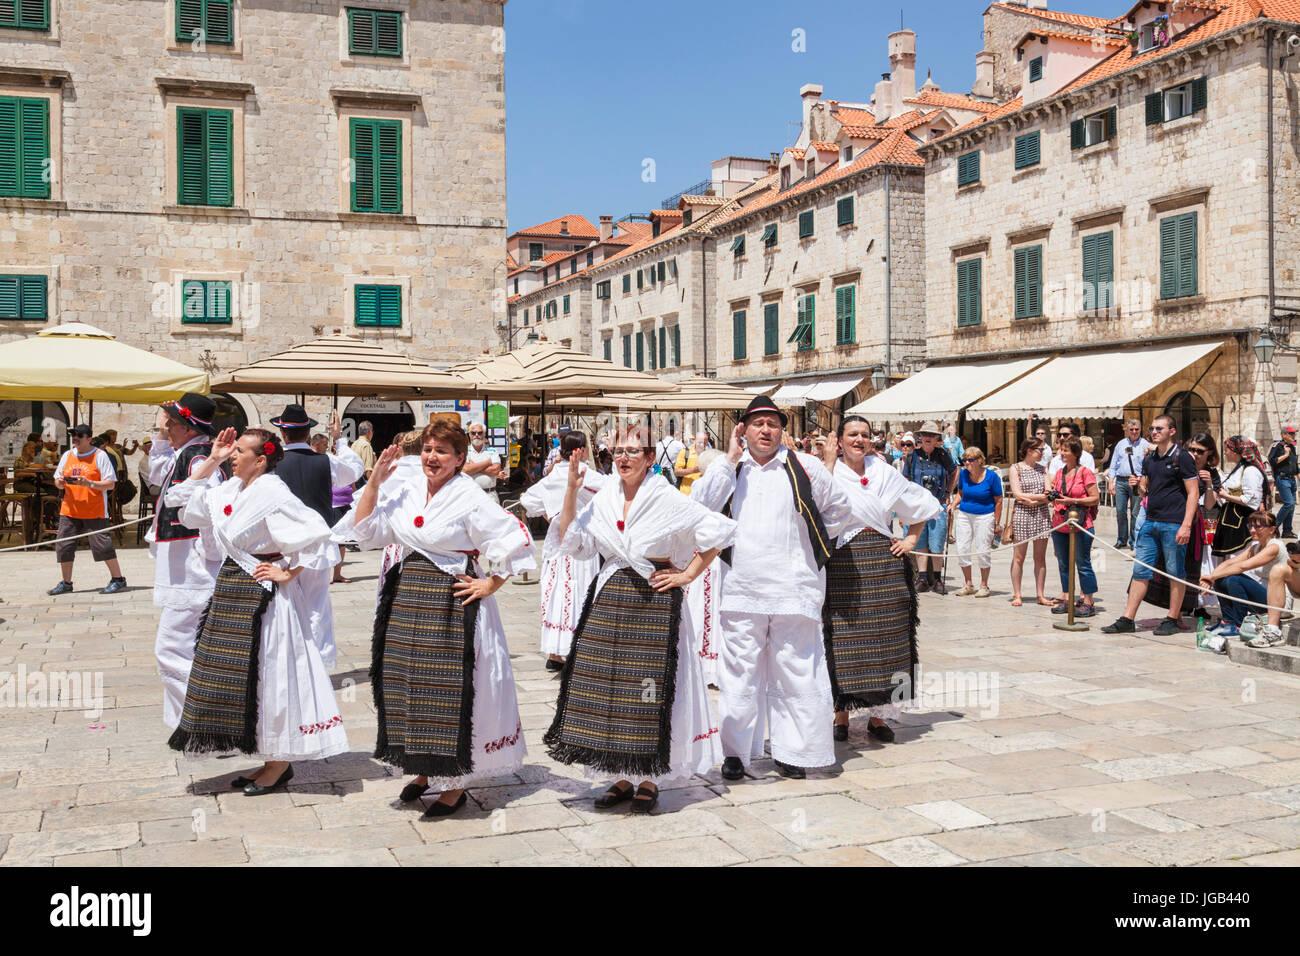 Croatia Dubrovnik Croatia Dalmatian coast tourists  local people folk dancing in national costume old town square - Stock Image